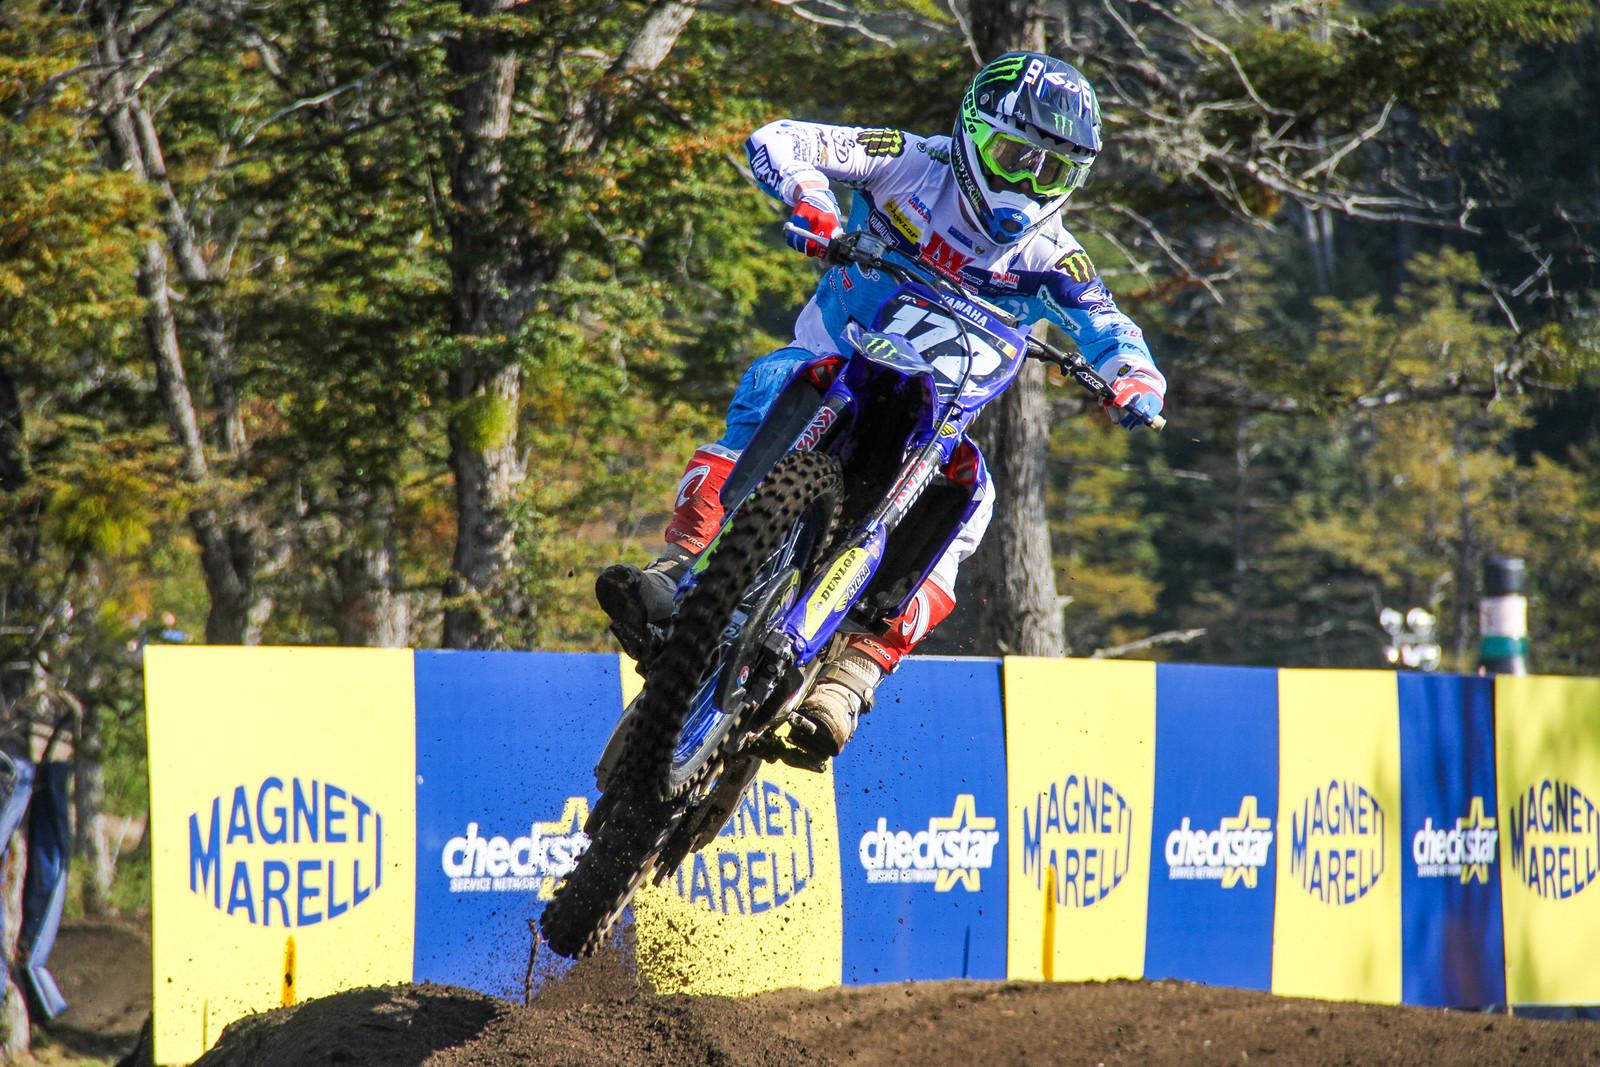 Brent van Doninck - Photo Blast: 2017 MXGP of Argentina - Motocross Pictures - Vital MX